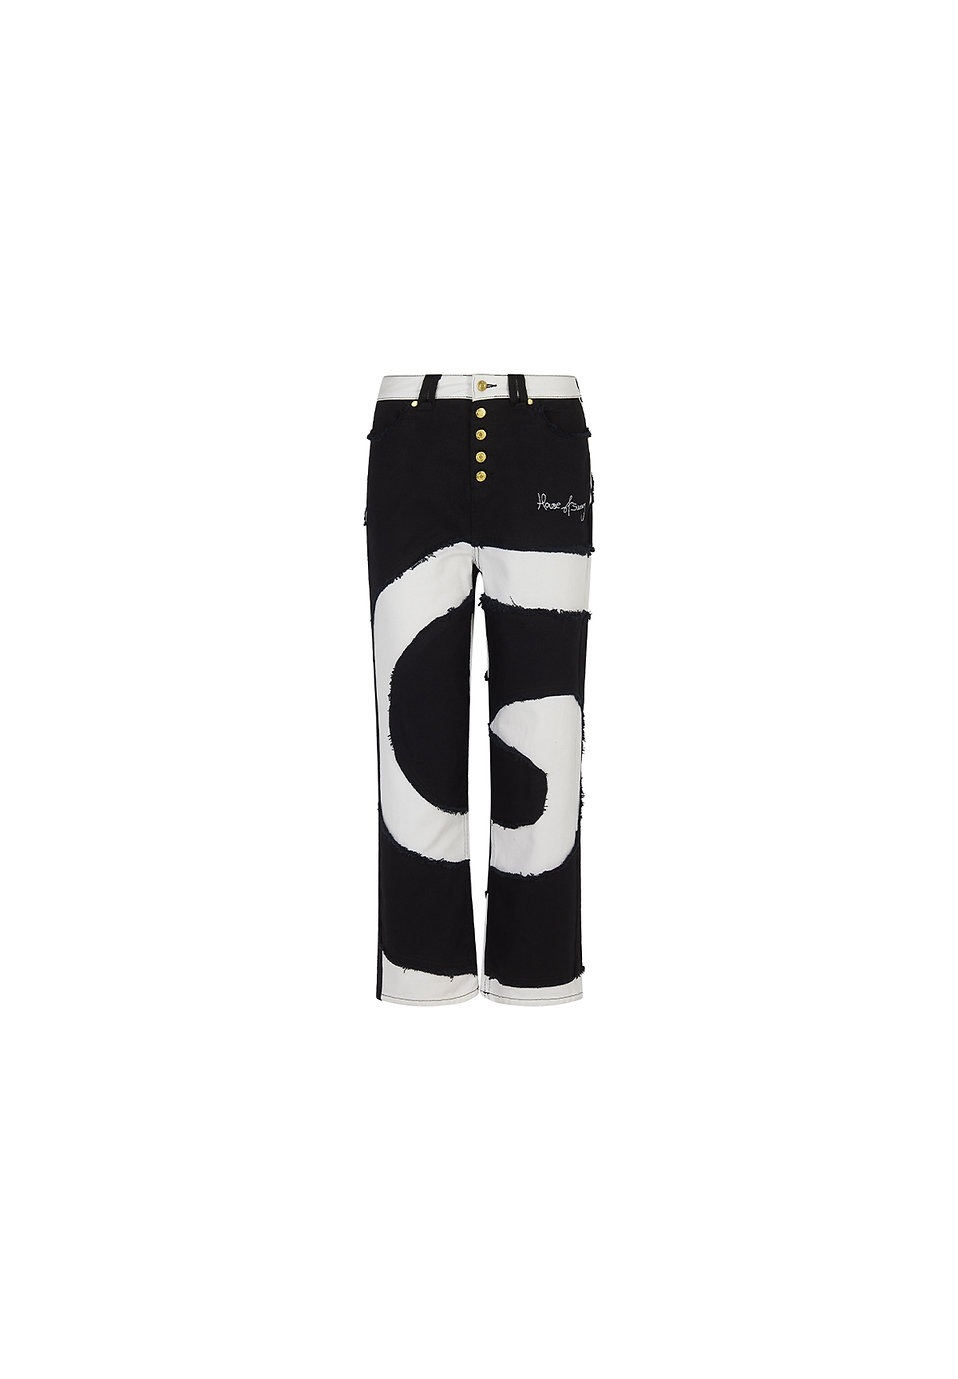 VOL18103 Black and White Swirl jeans A.jpg